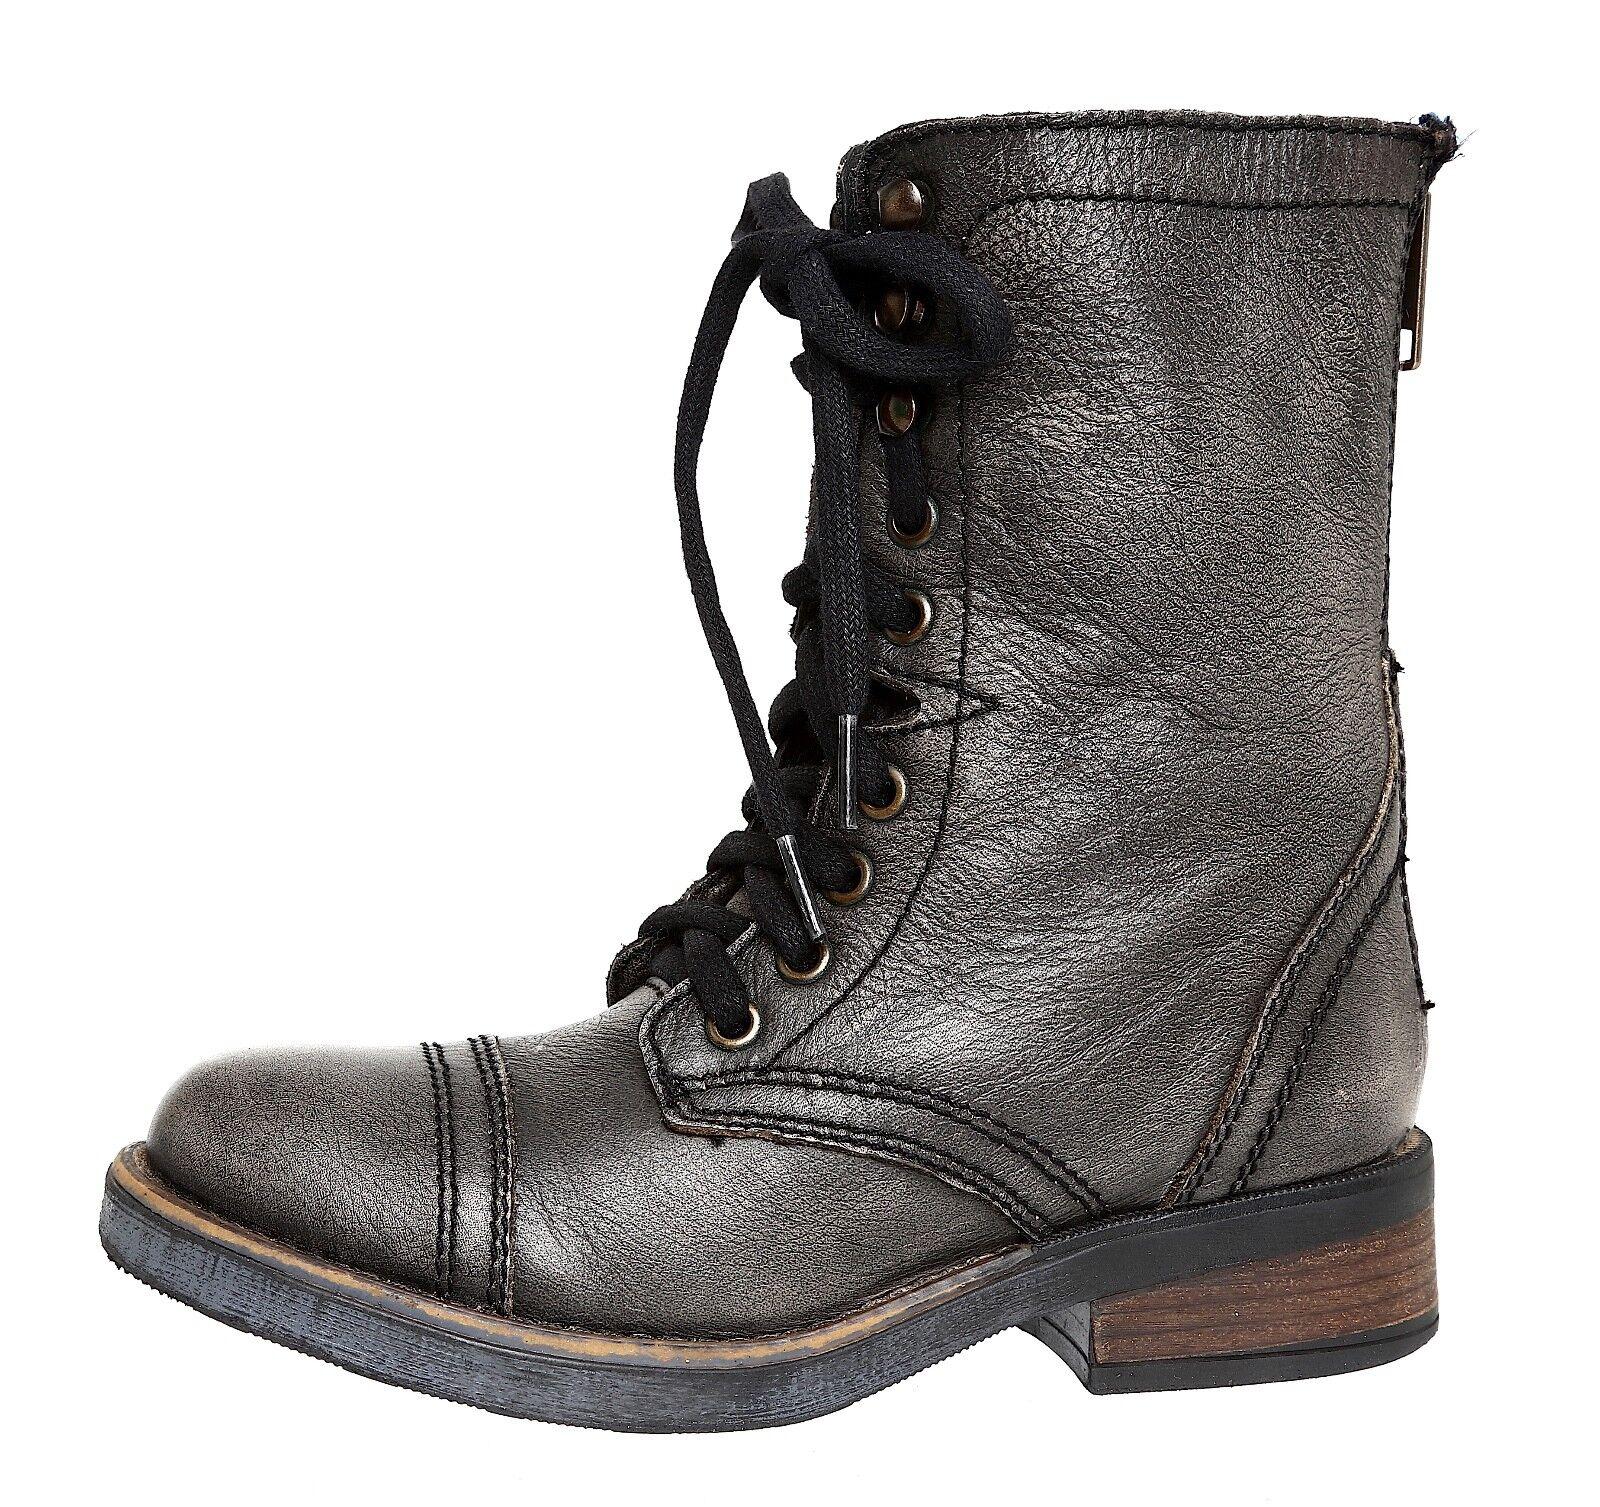 Steve Madden Munch Military Leather Boot Grey Women Sz 5.5 M 4001